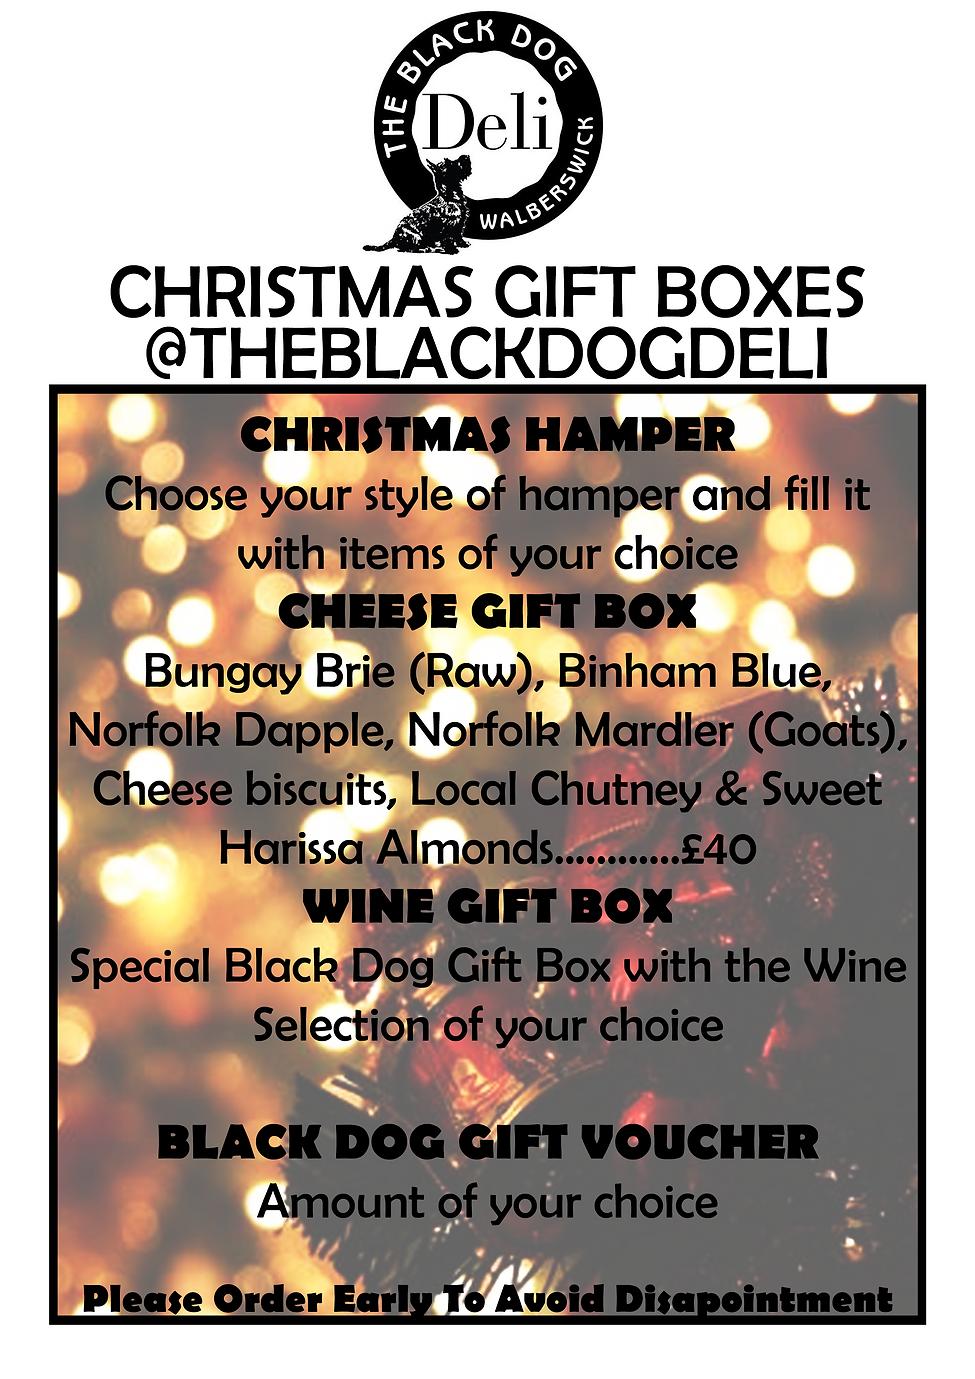 Chritsmas Gift Boxes Deli.png